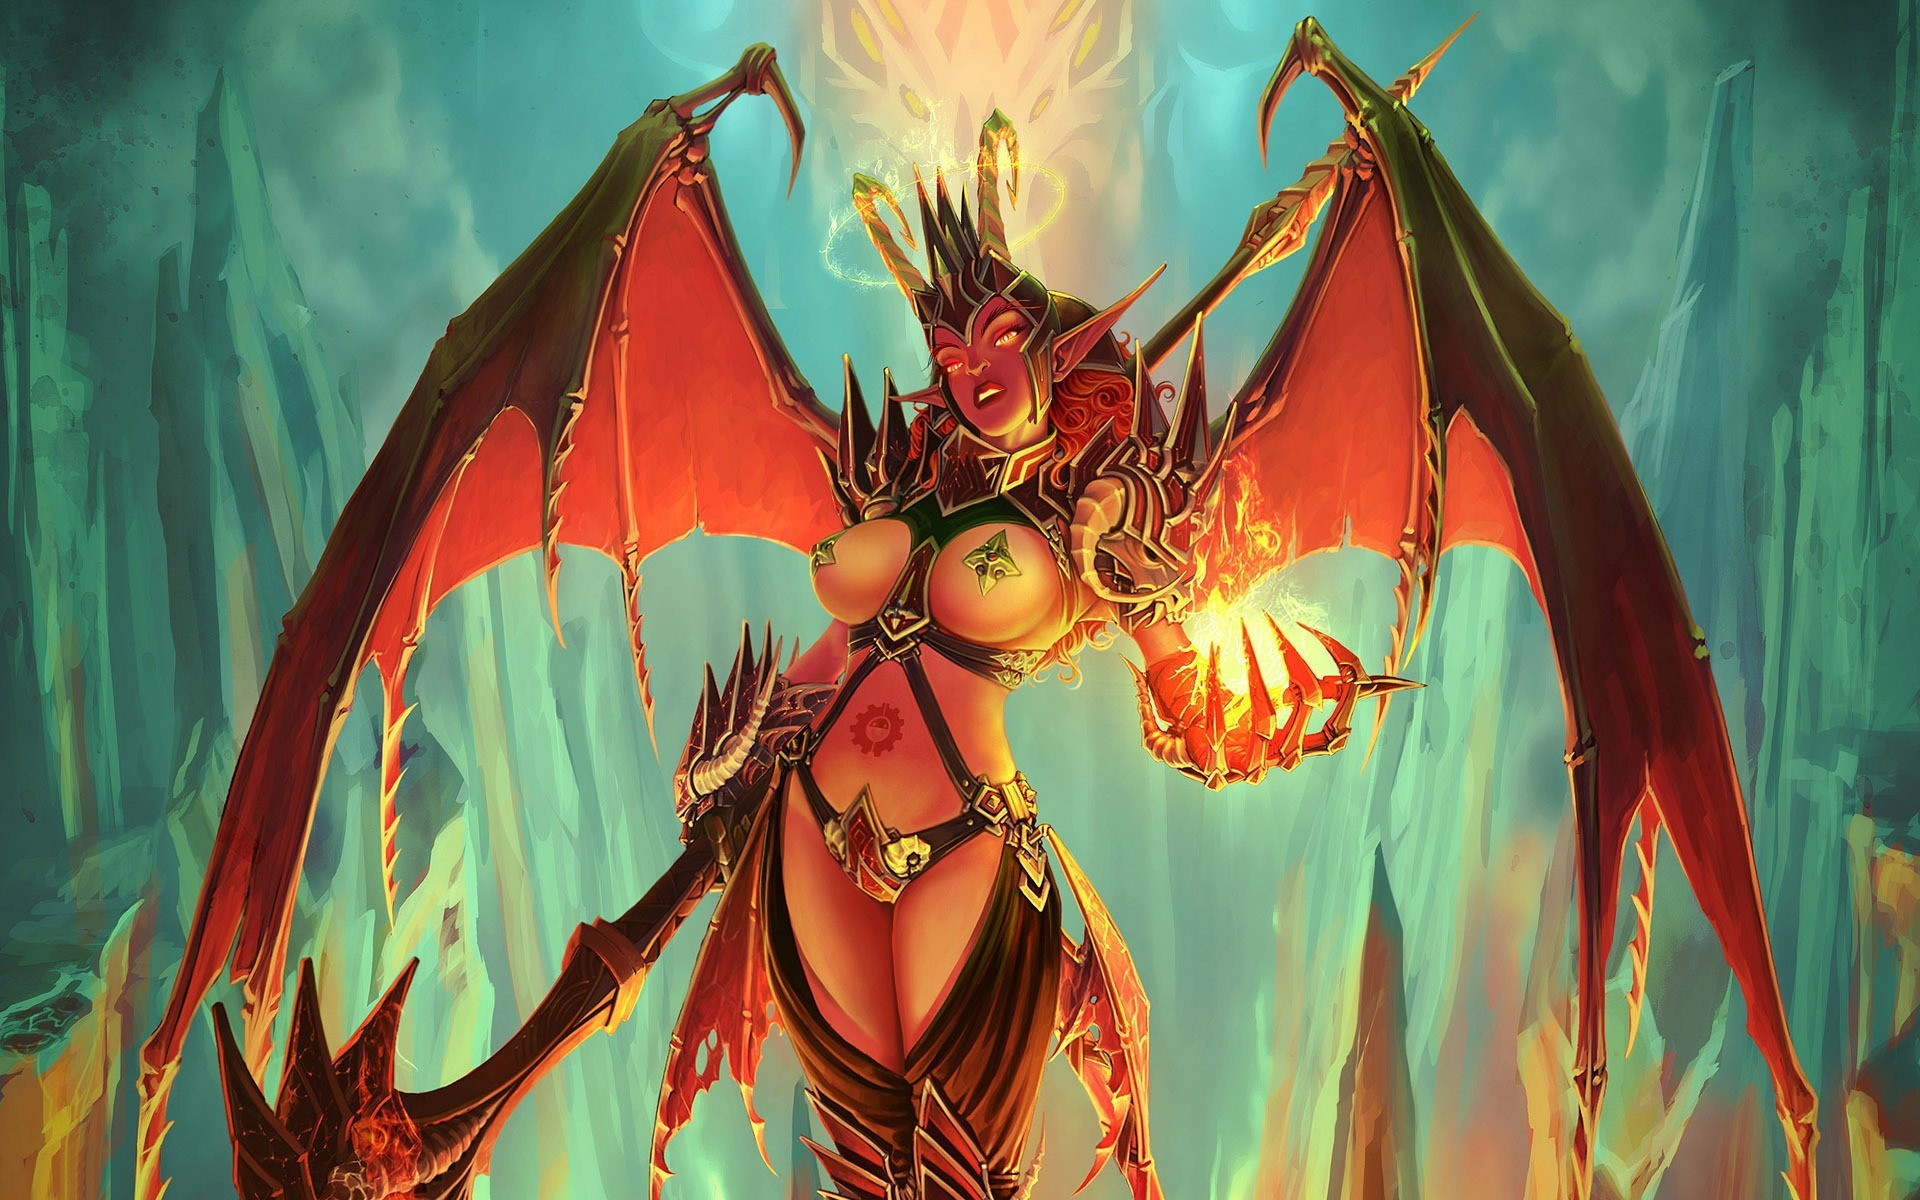 Res: 1920x1200, Female Demon Wallpaper